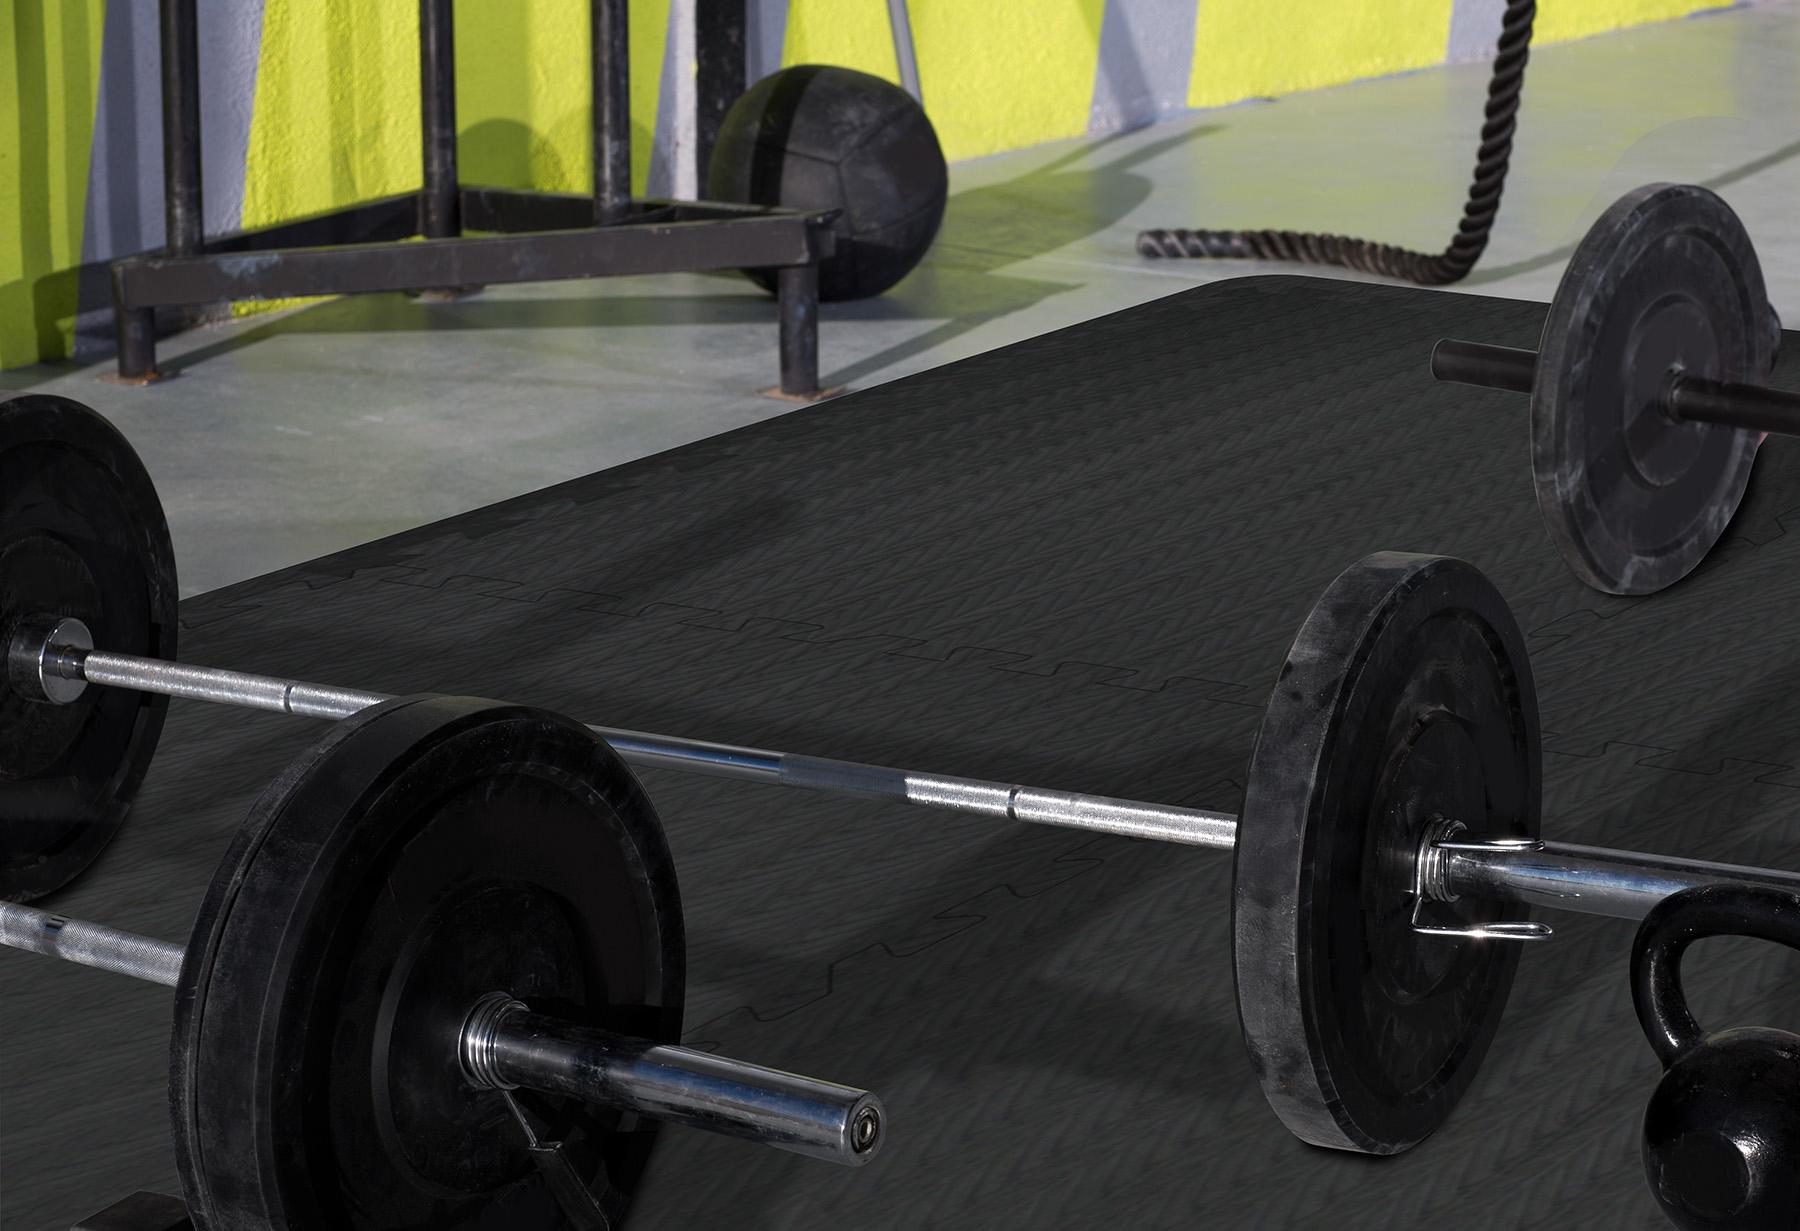 Shock Athletic Flex Series flooring